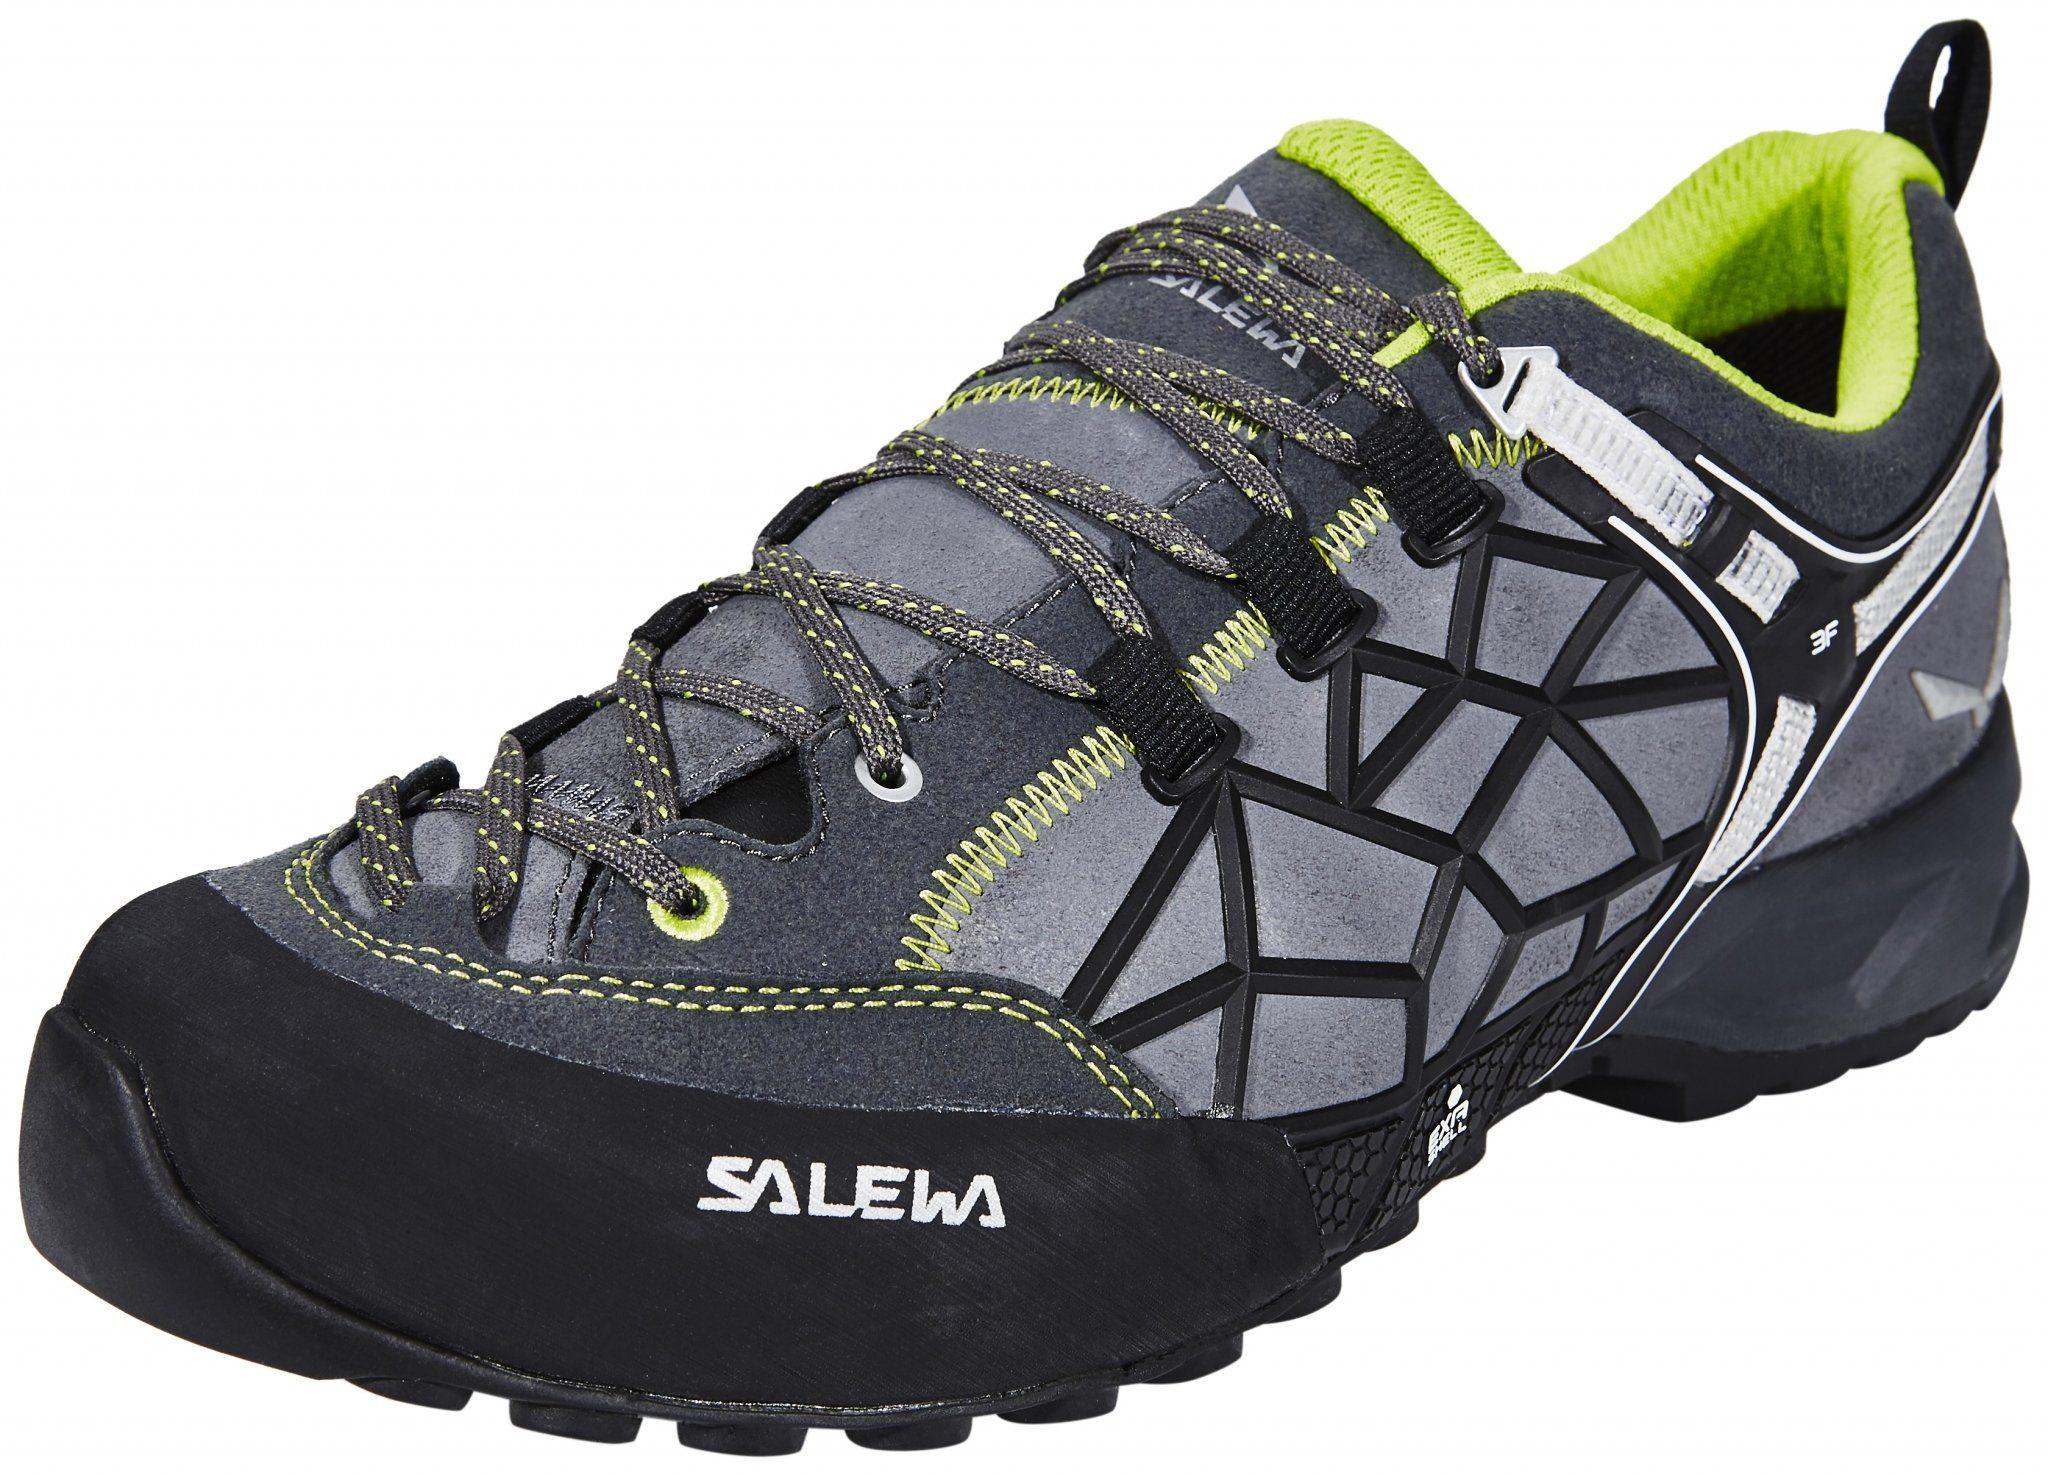 Salewa Kletterschuh »Wildfire Pro Approach Shoes Unisex«